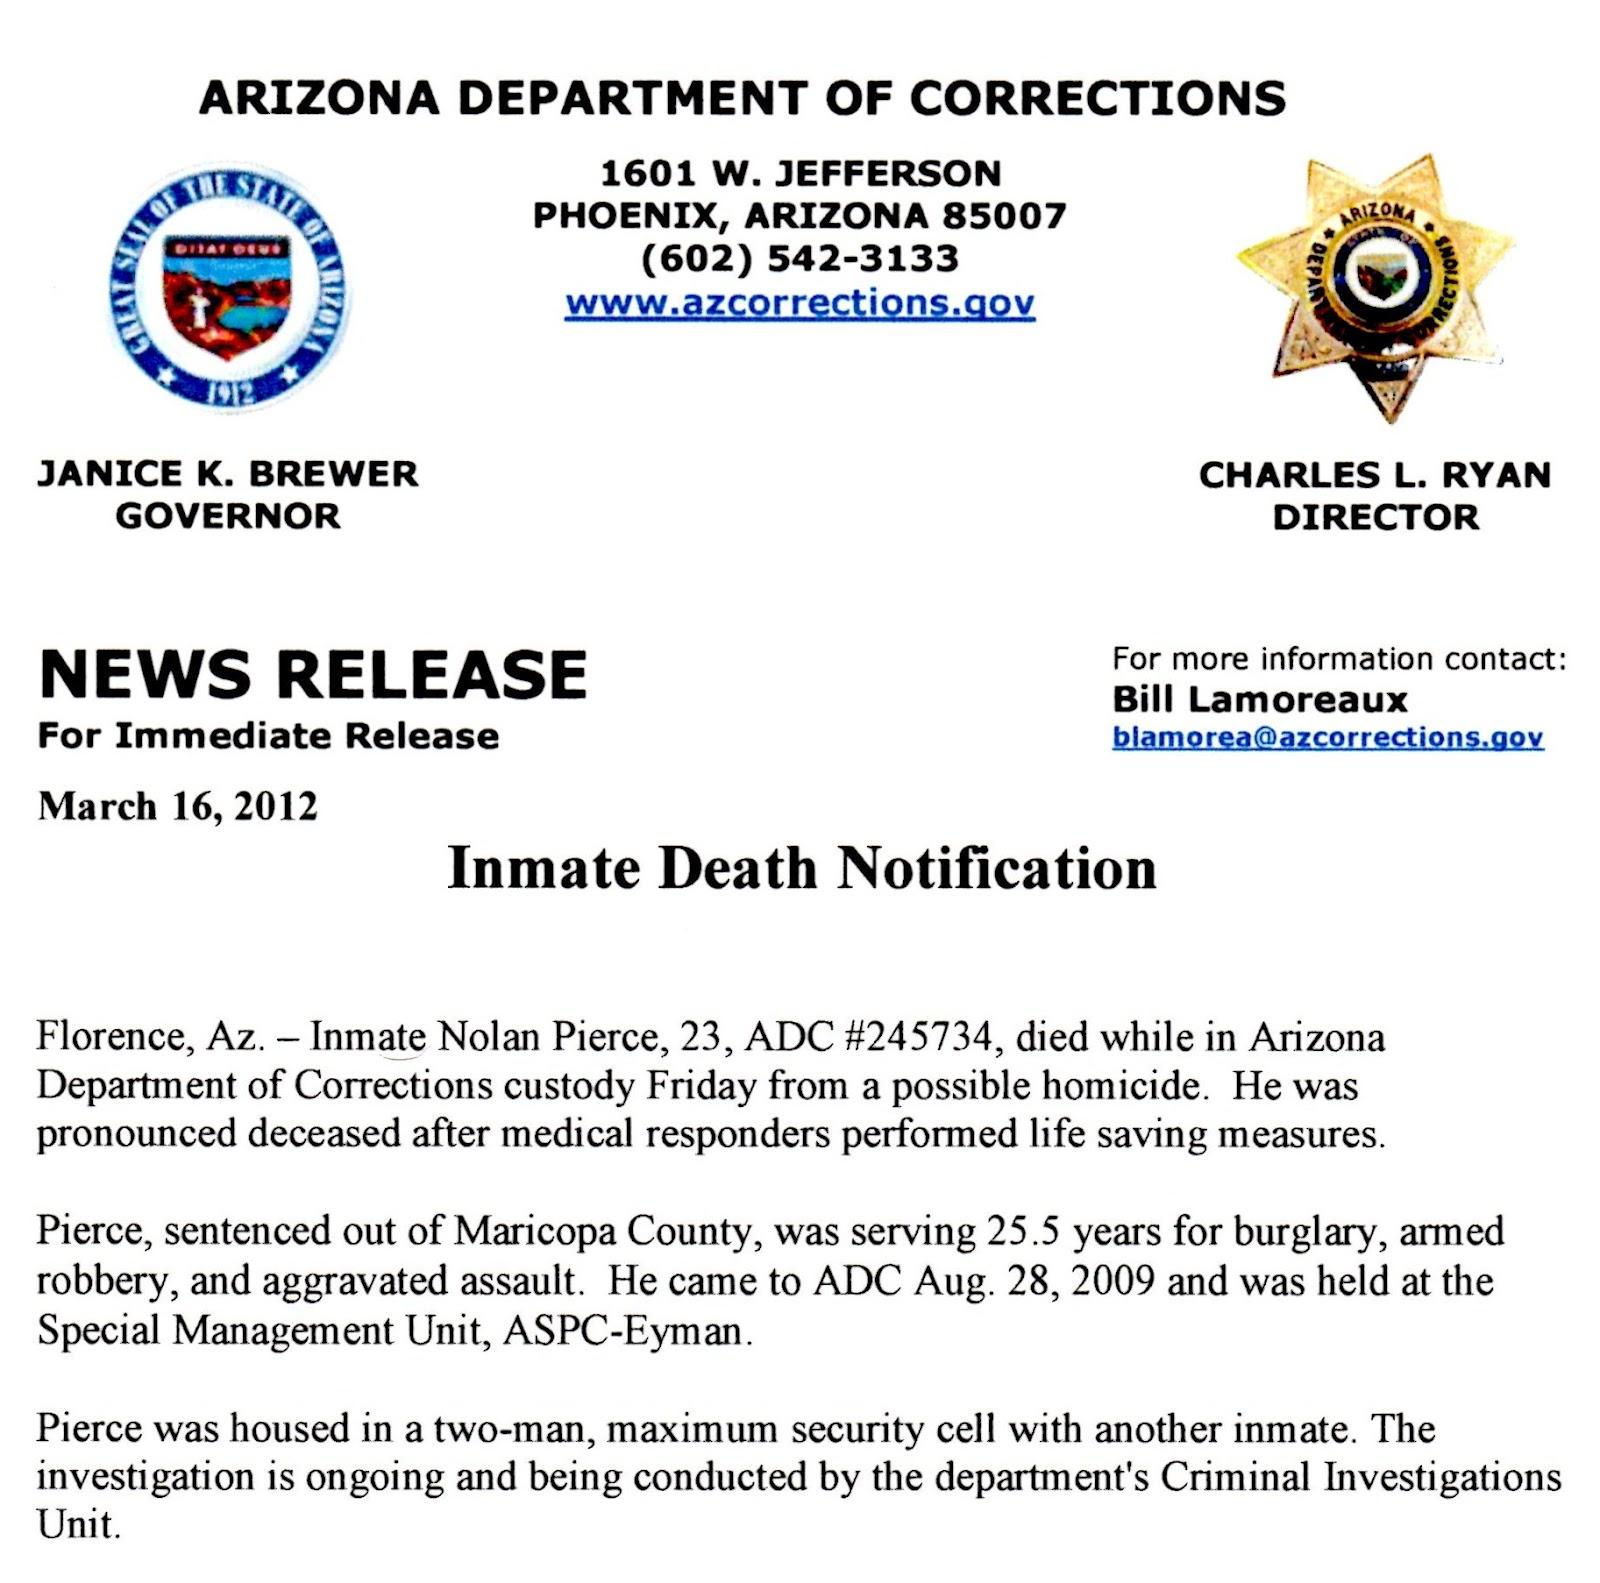 Arizona Prison Watch: ASPC-Eyman Deaths in Custody: Nolan